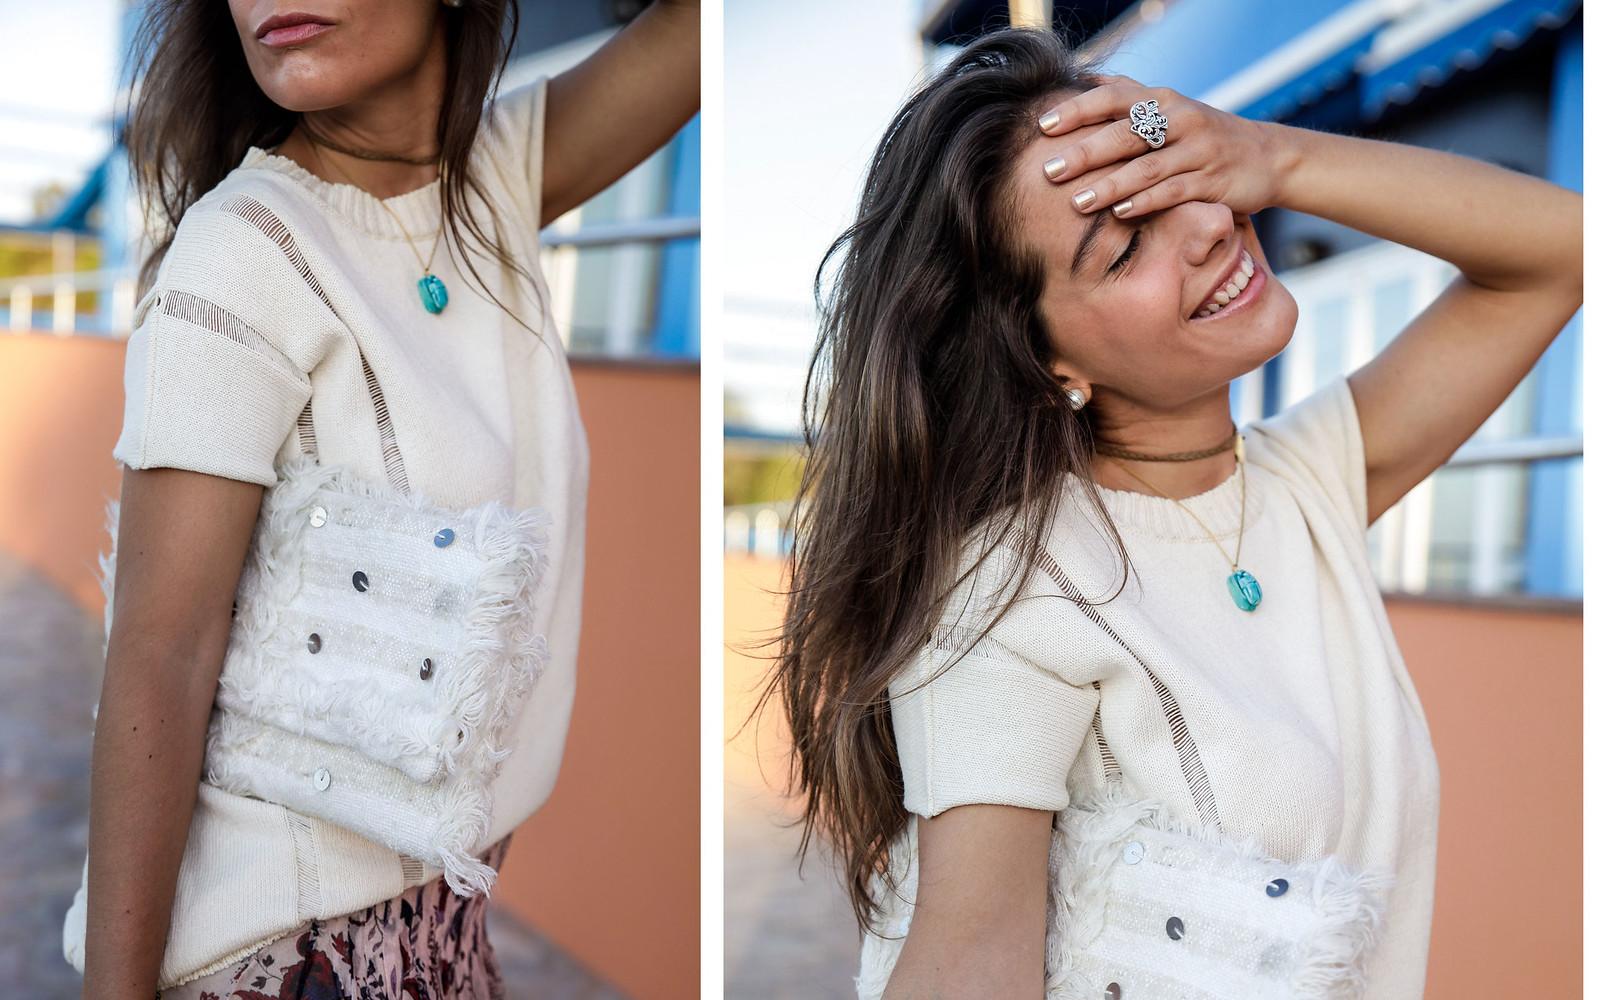 013_blusa_punto_falda_flores_summer_outfit_theguestgirl_rüga_schade_jewels_steve_madden_.magali_pasacal_influencer_barcelona_blogger